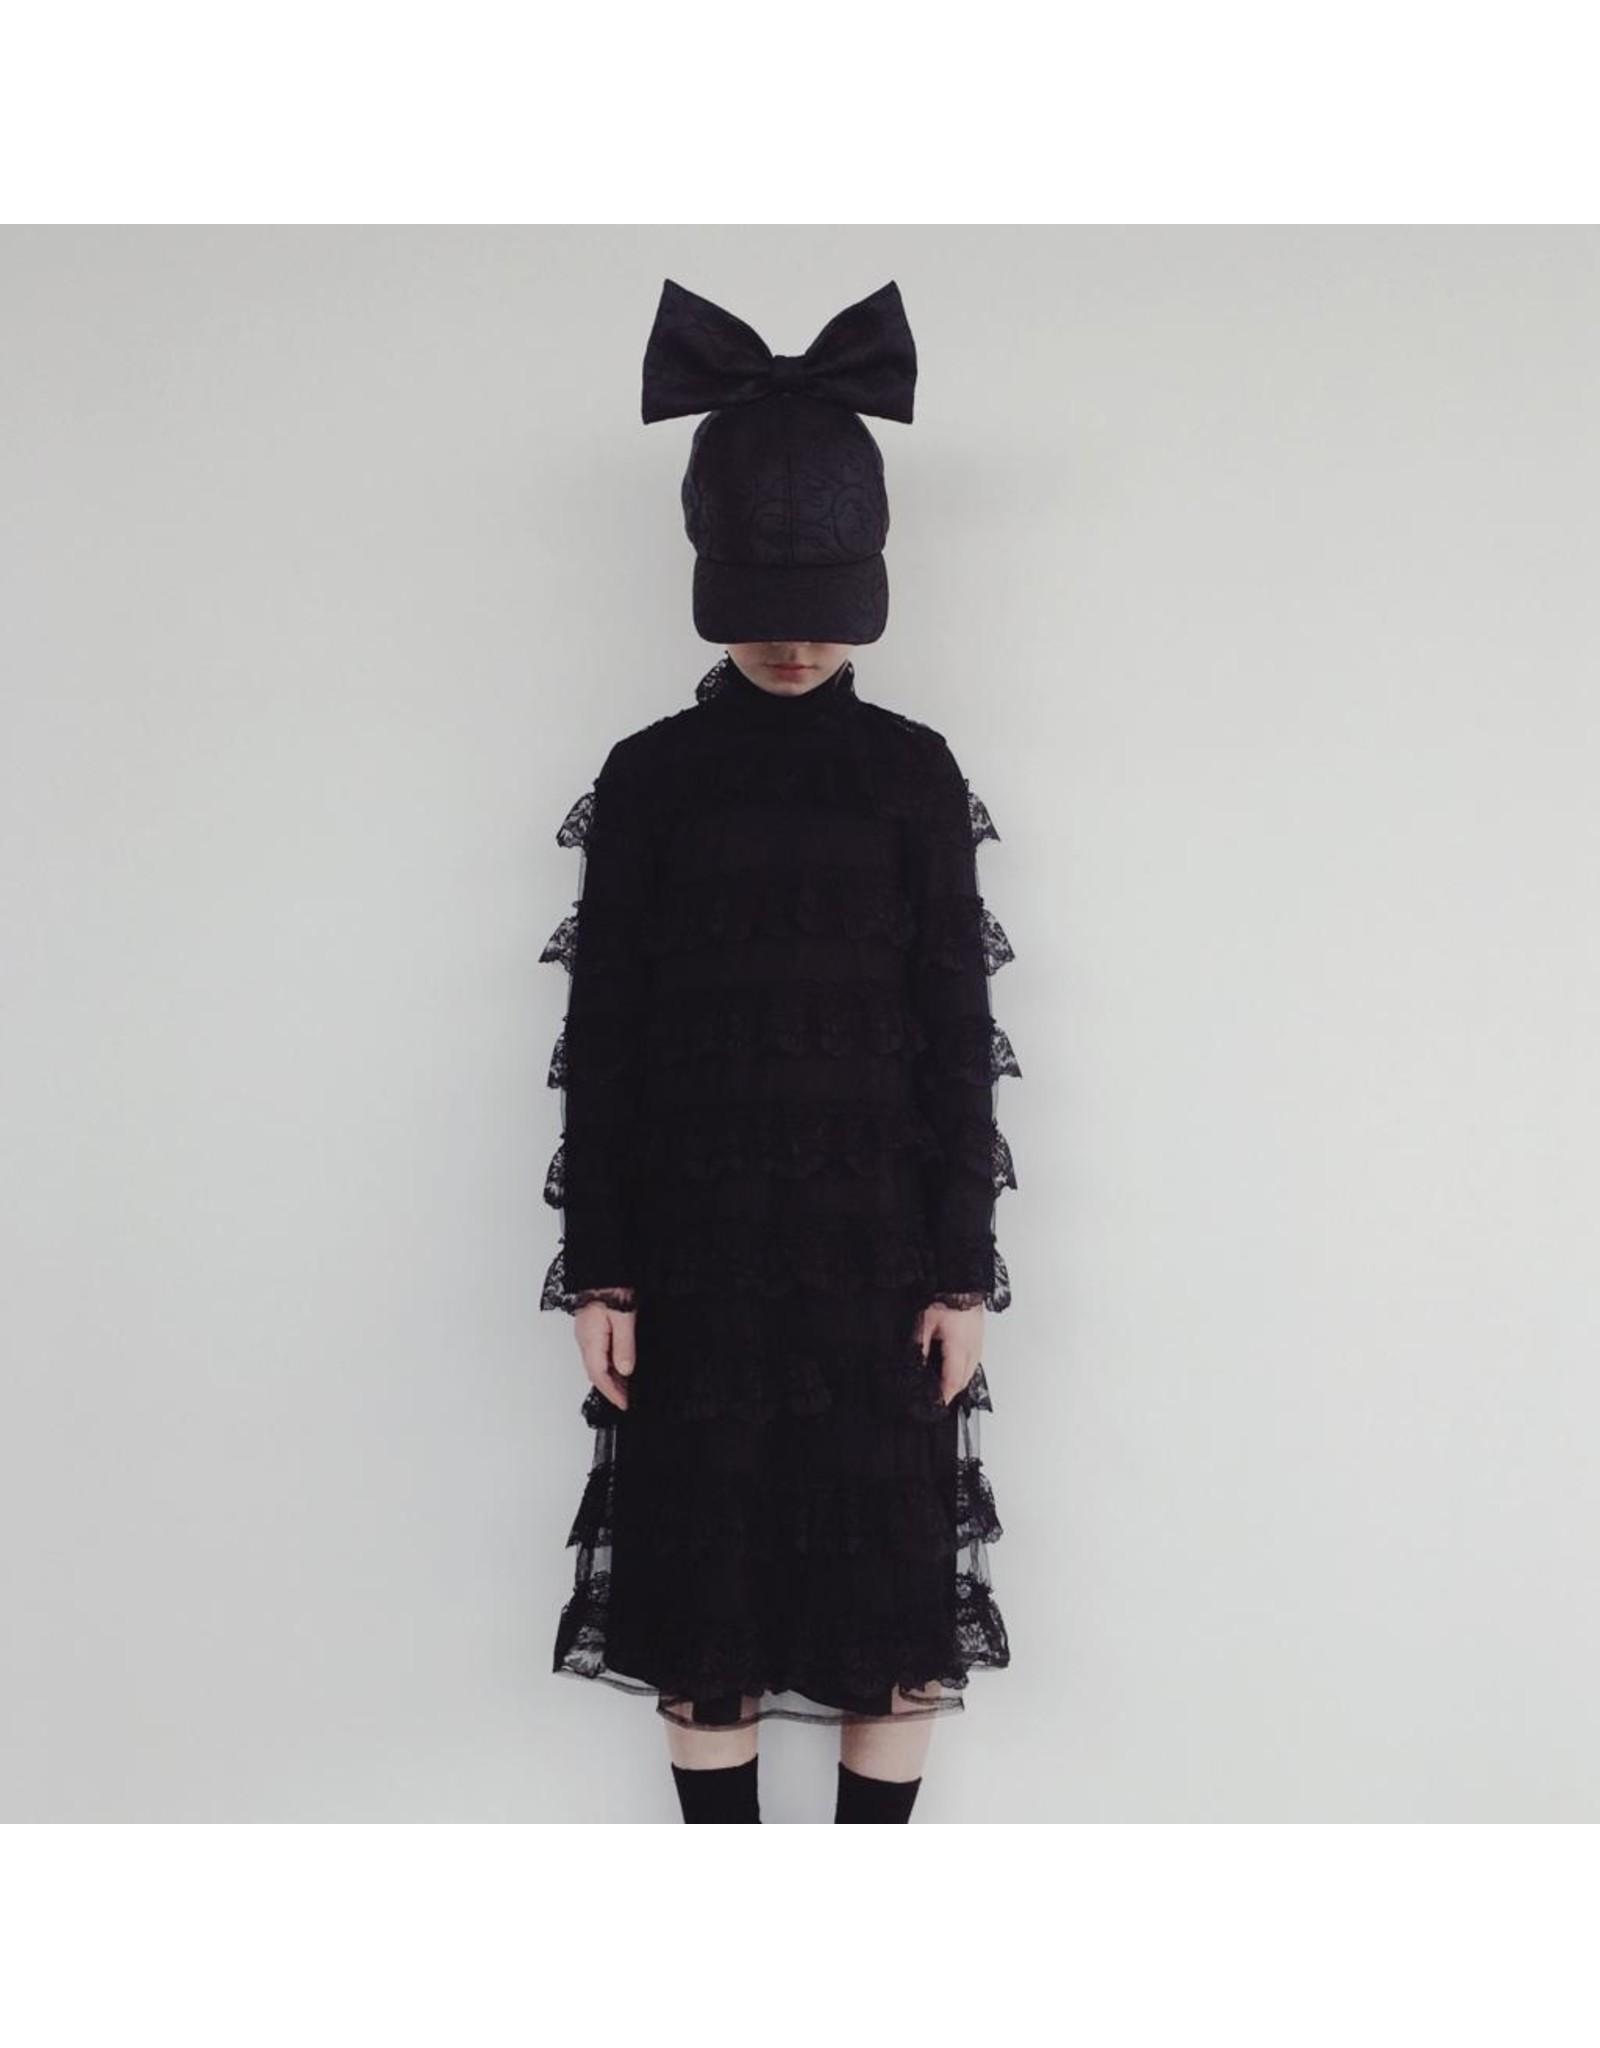 CRLNBSMNS PS21 4067657 broderie dress black